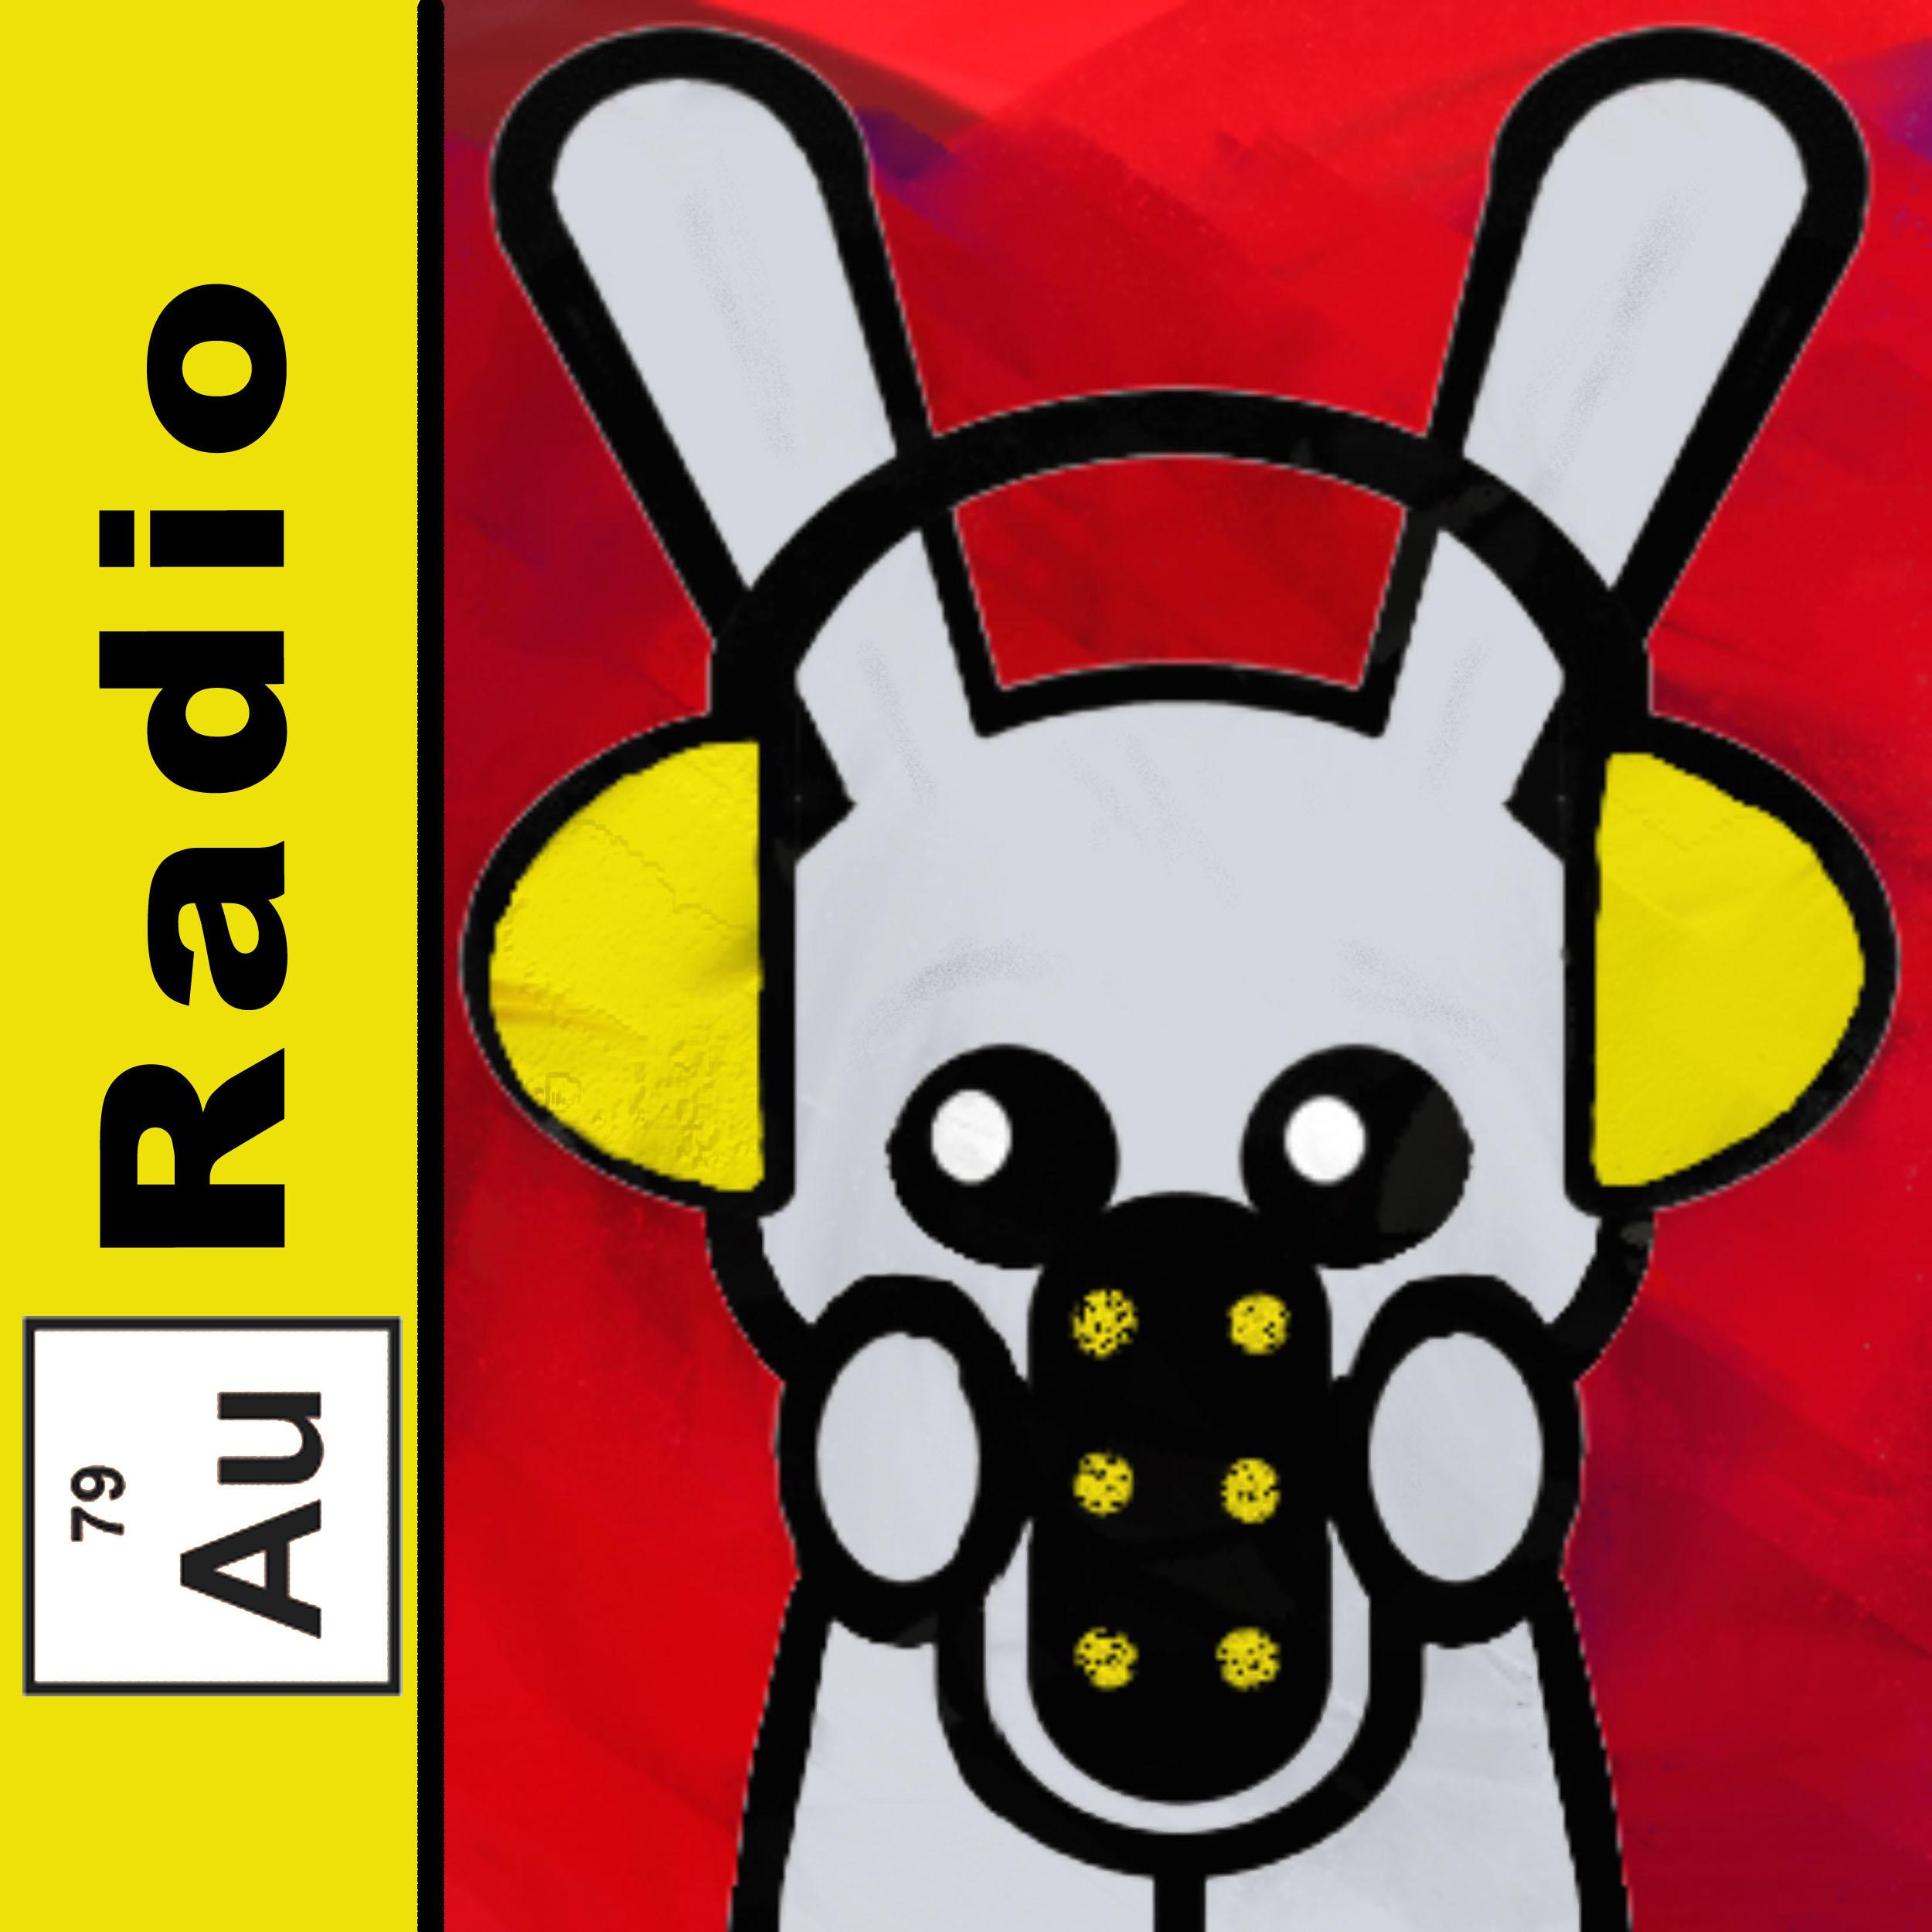 AU Radio Season 2 - Episode 45: Whats New This Week show art